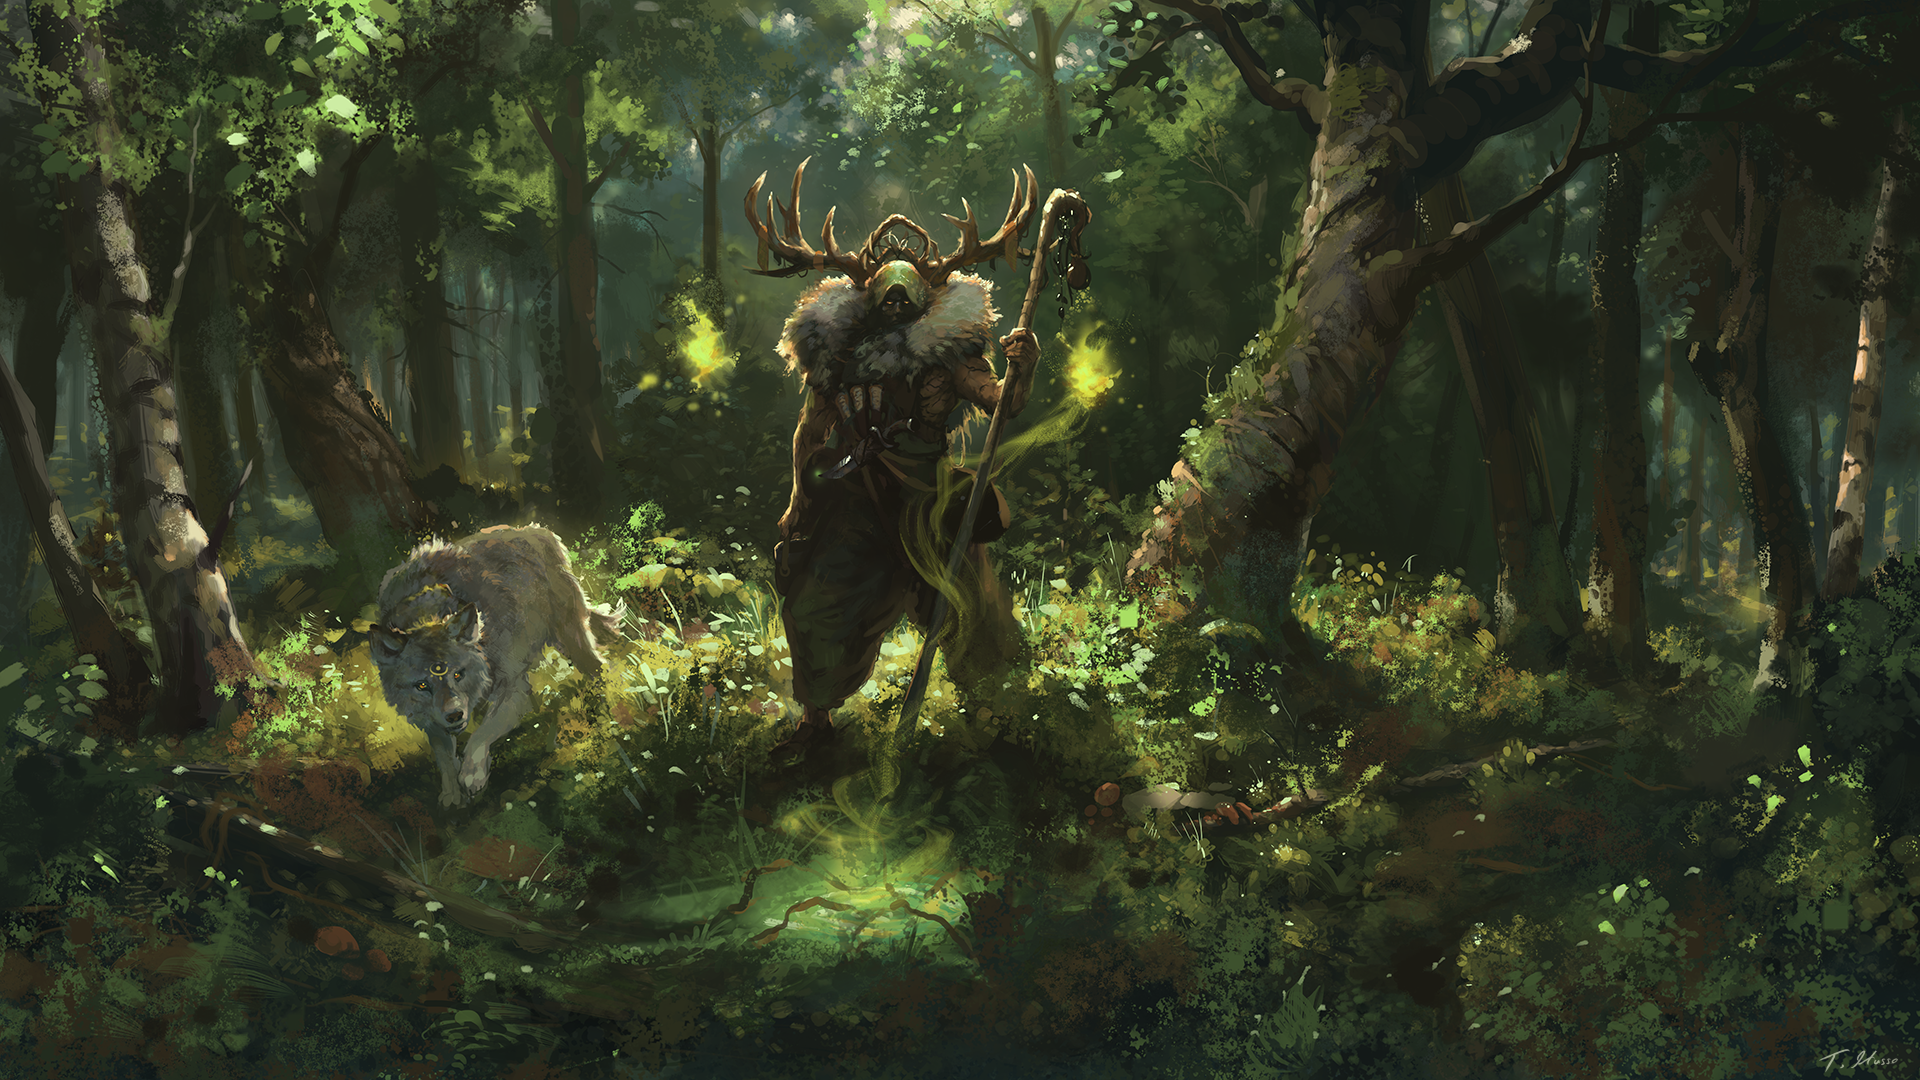 Exiled Druids of Lornwood